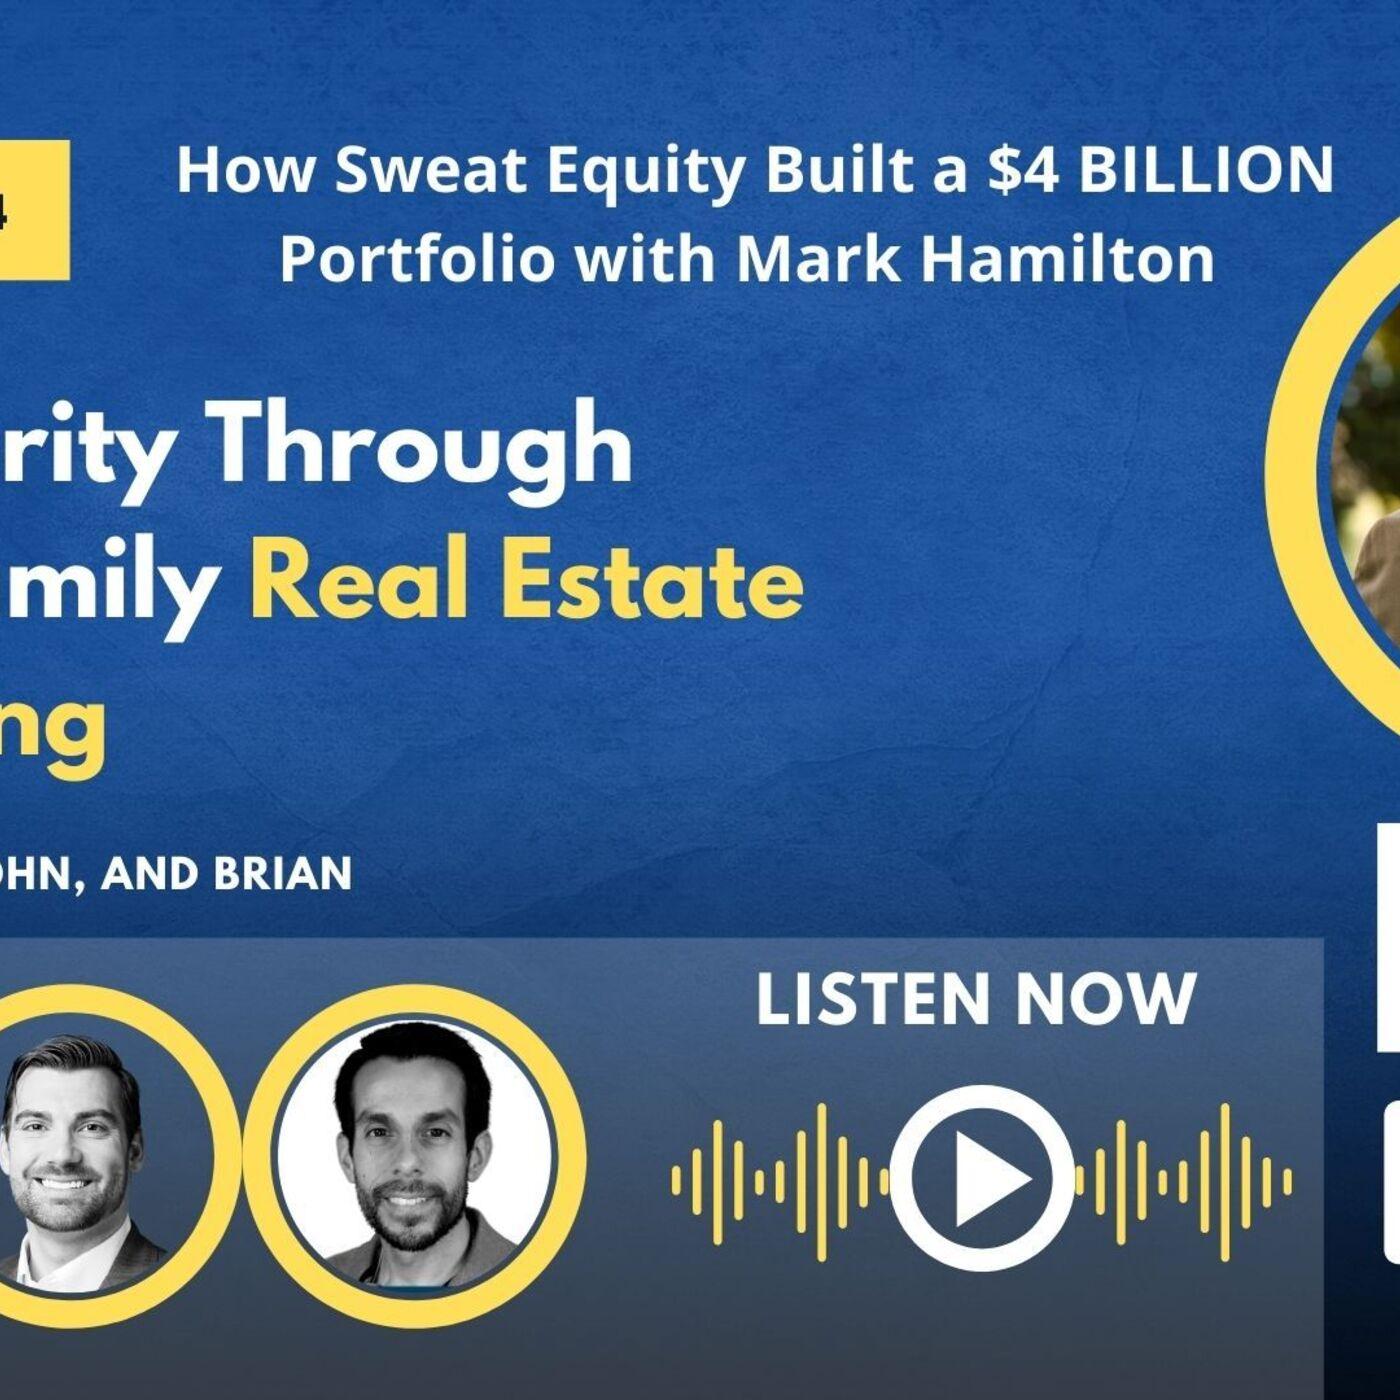 How Sweat Equity Built a $4 BILLION Portfolio with Mark Hamilton